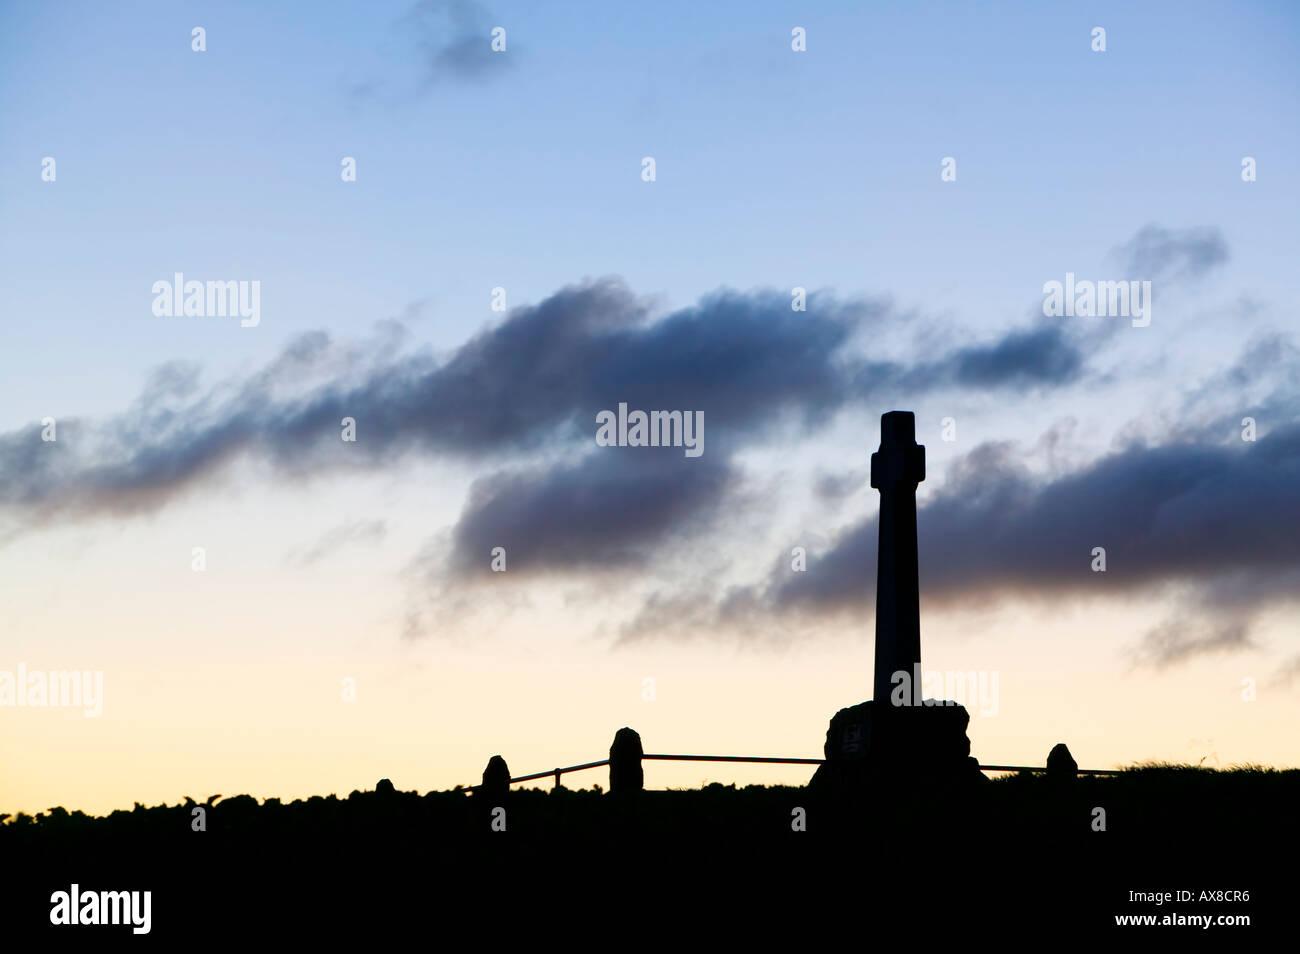 Memorial for the Battle of Flodden Field, near Branxton, Northumberland, England Stock Photo